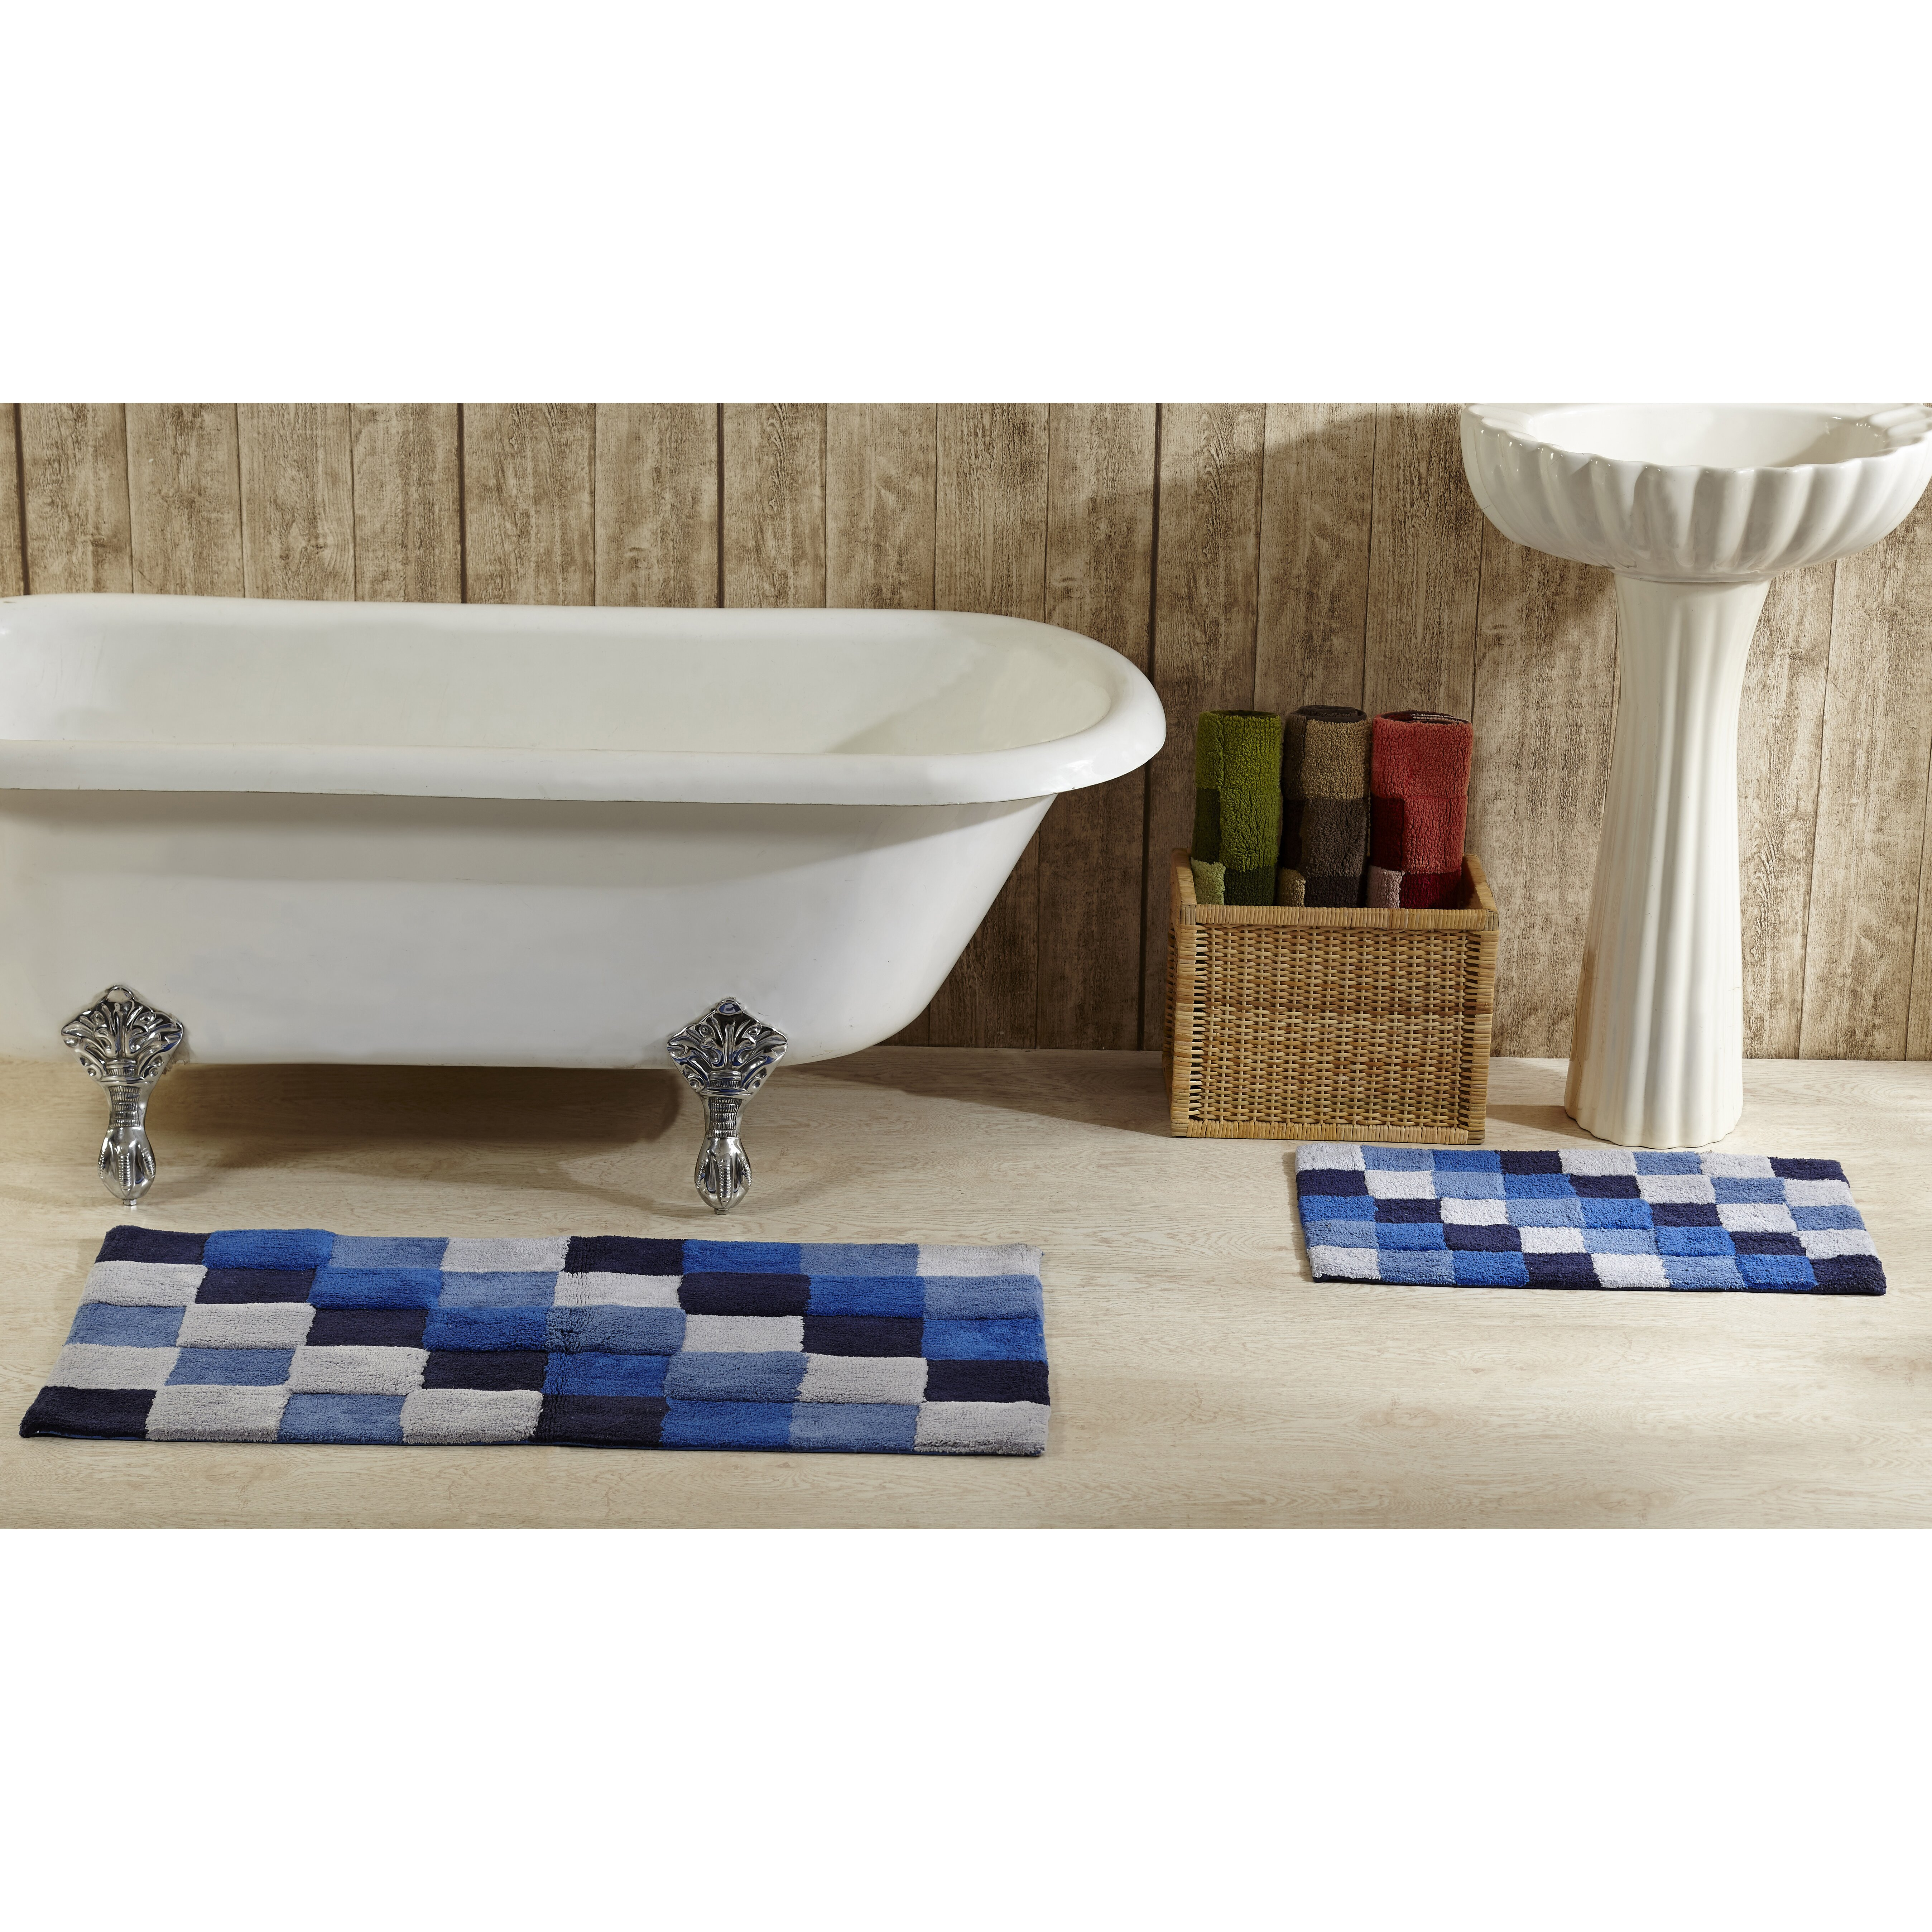 better trends tiles bath rug reviews wayfair. Black Bedroom Furniture Sets. Home Design Ideas